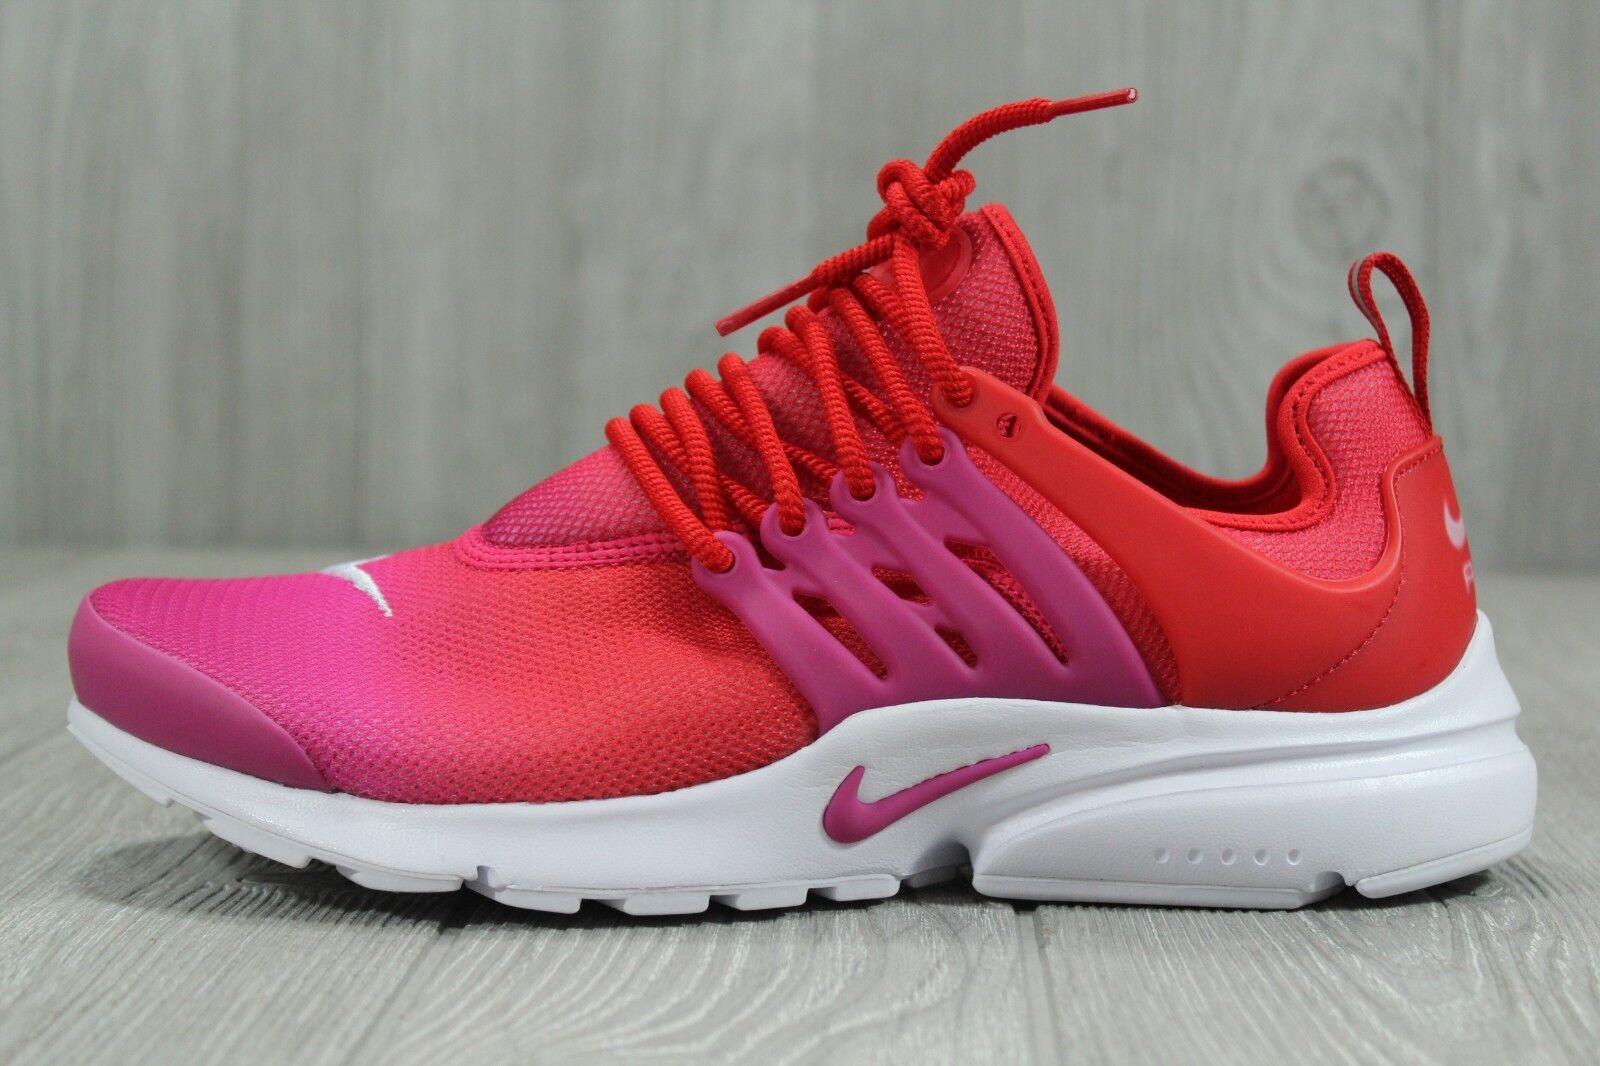 34 Nike Air Presto Running shoes Womens Size 6, 8, 10 Red Fuchsia AR3899-600